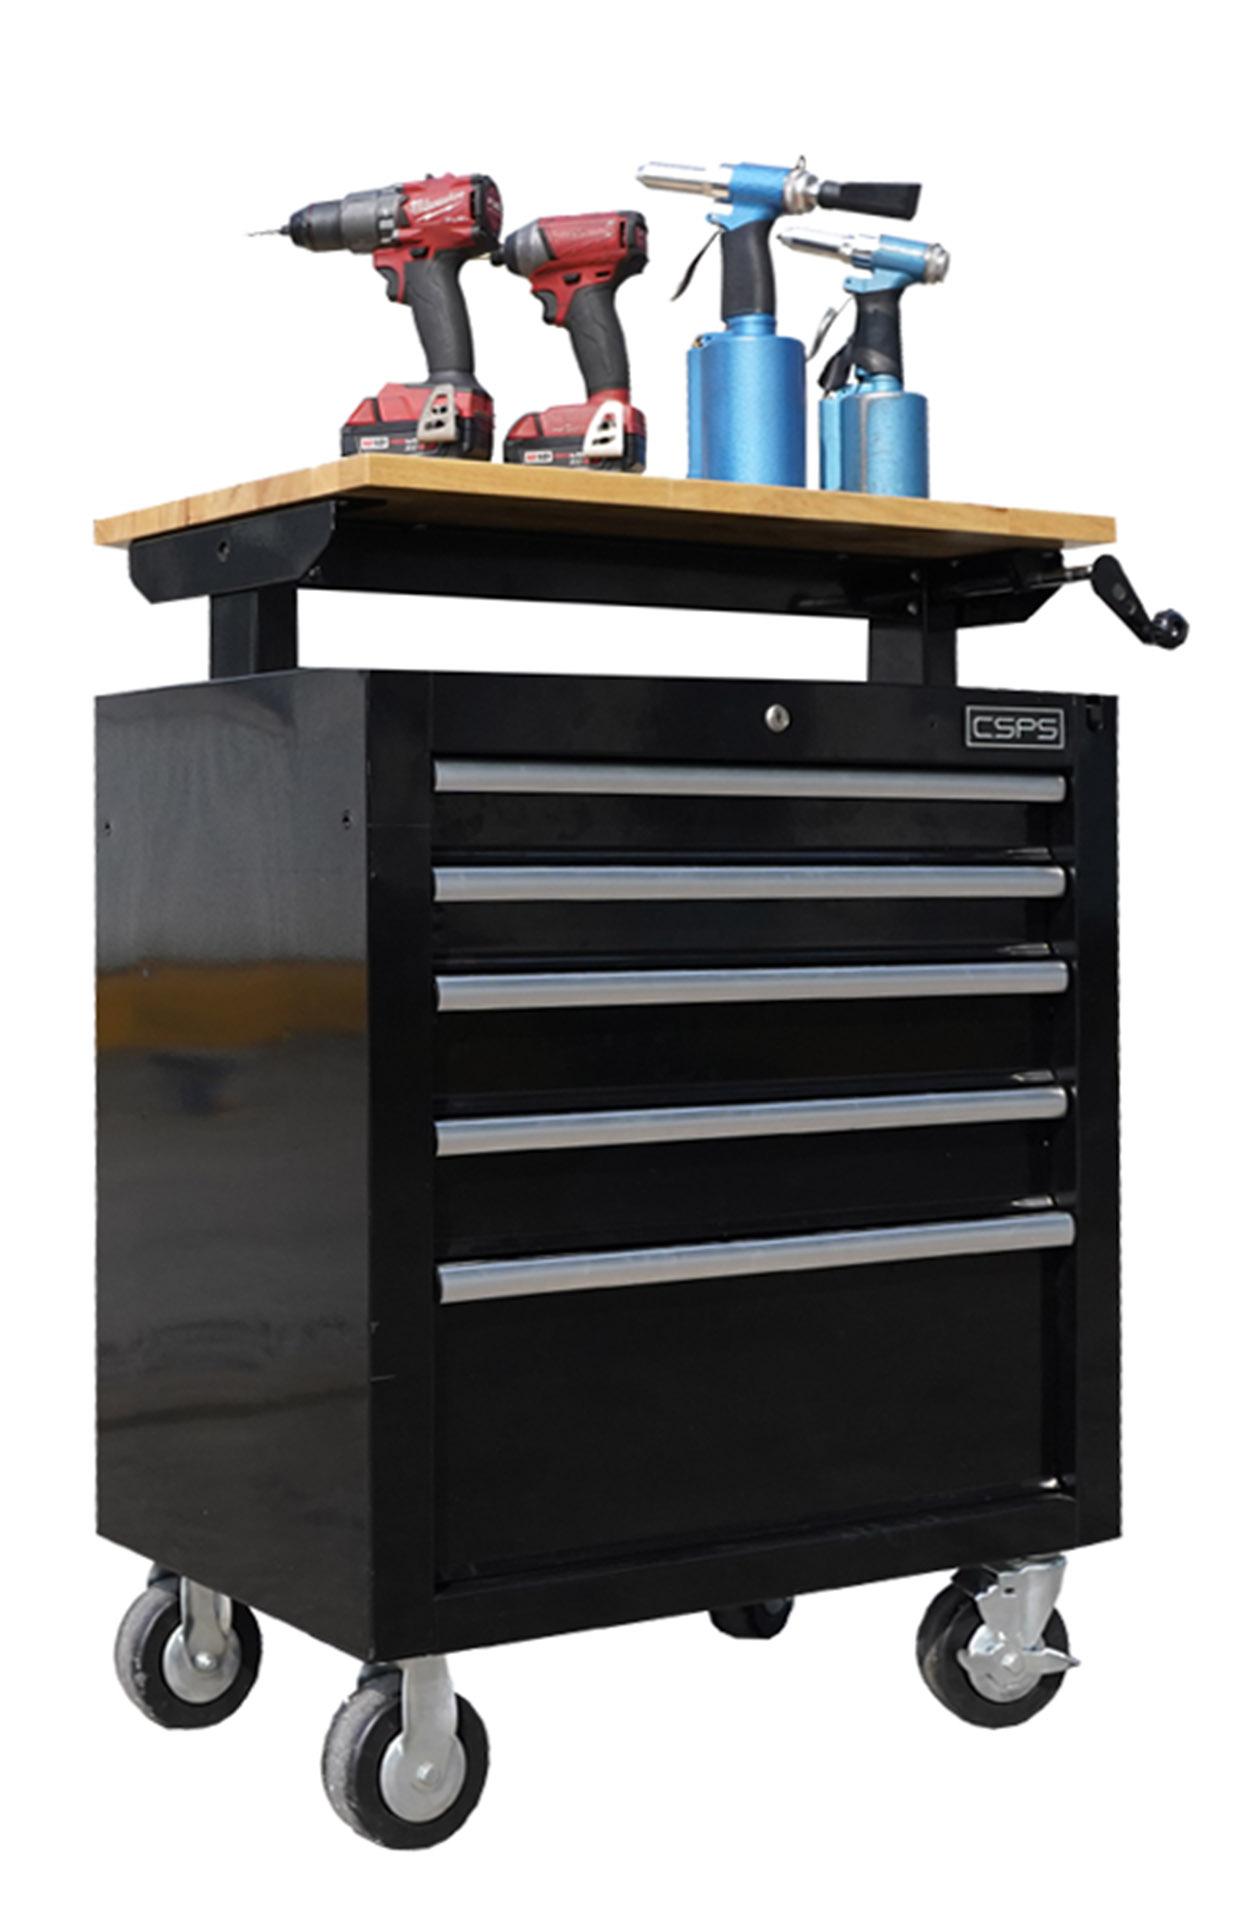 Adjustable toolchest